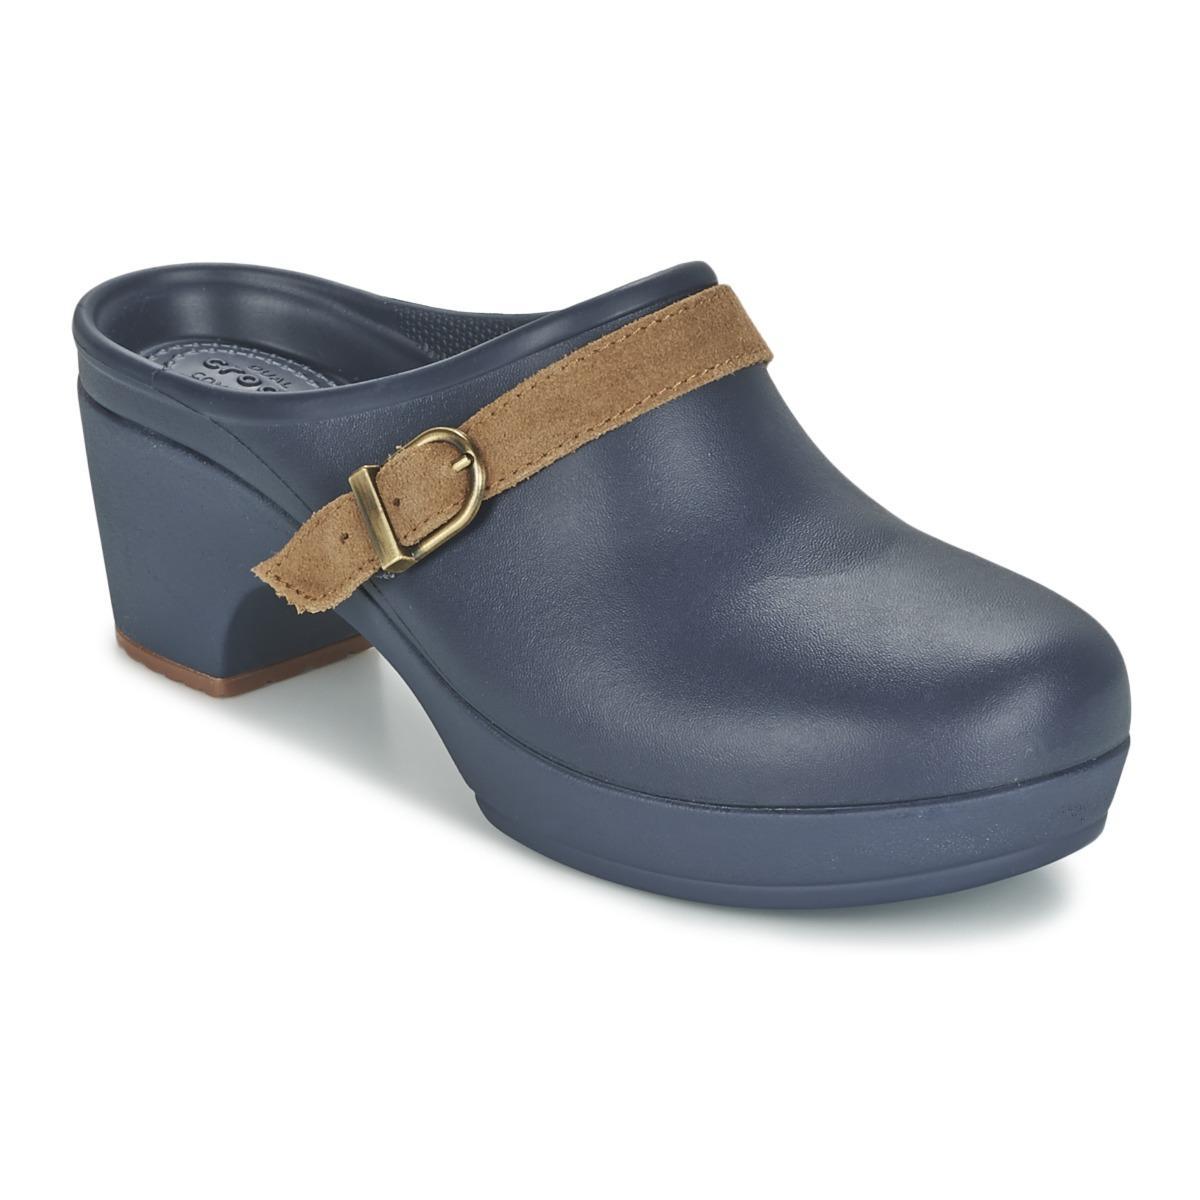 29ec49a3058 Crocs™ Sarah Clog Women's Clogs (shoes) In Multicolour in Blue - Lyst